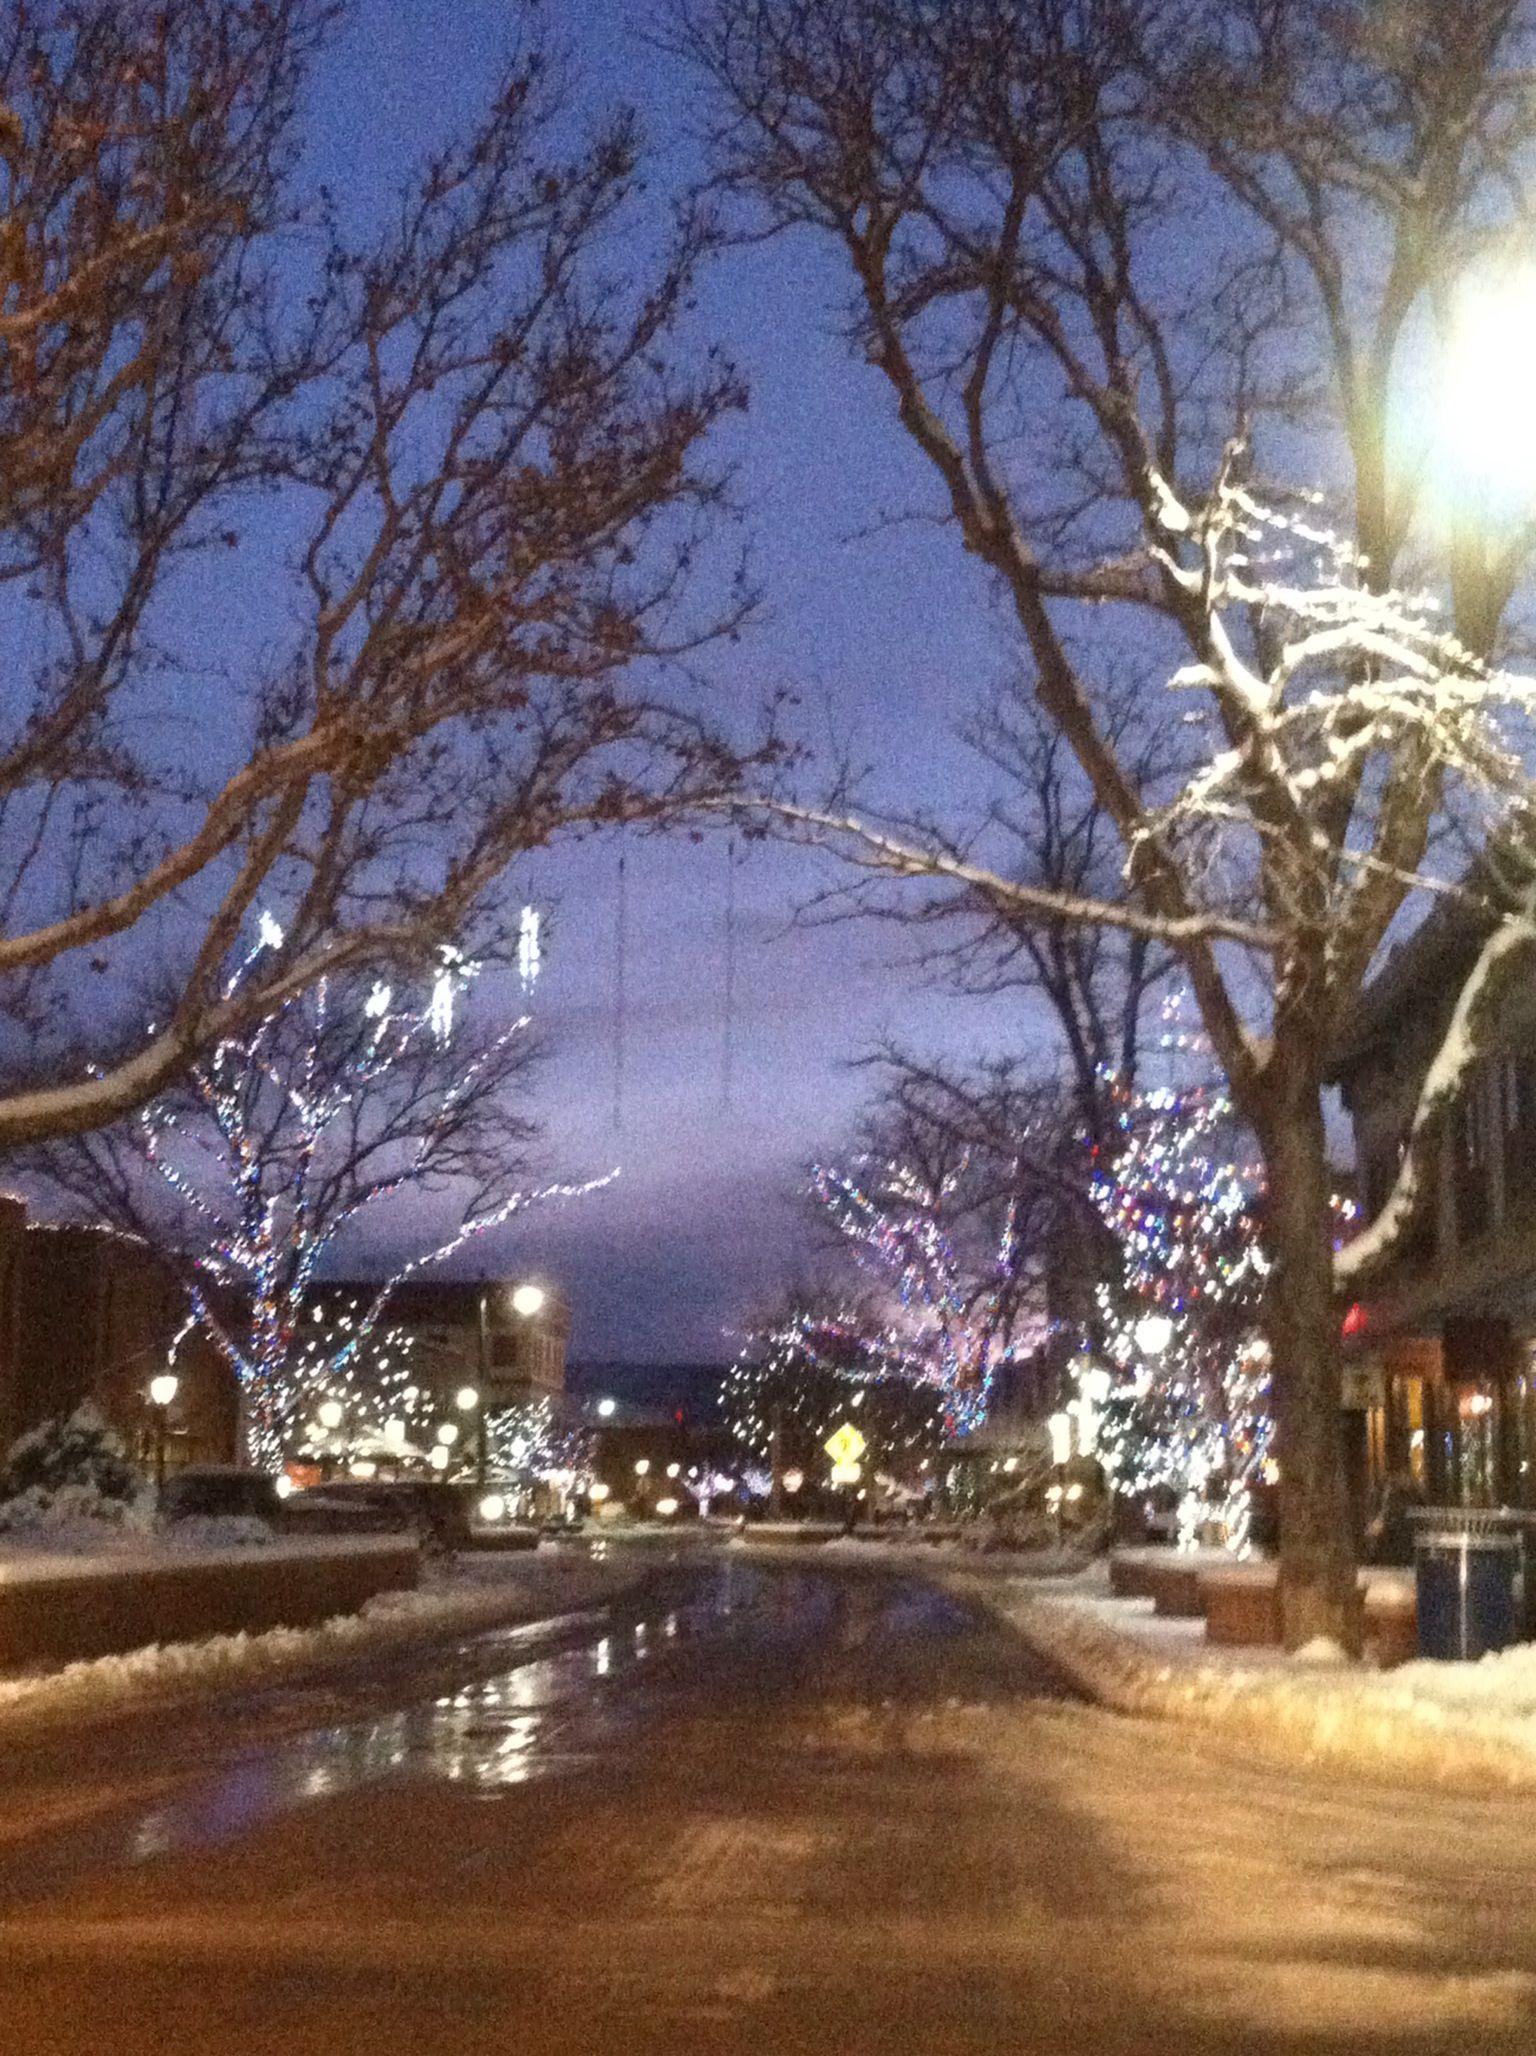 Grand Junction Christmas Lights 2019 Holiday lights in downtown Grand Junction.   Grand Junction in